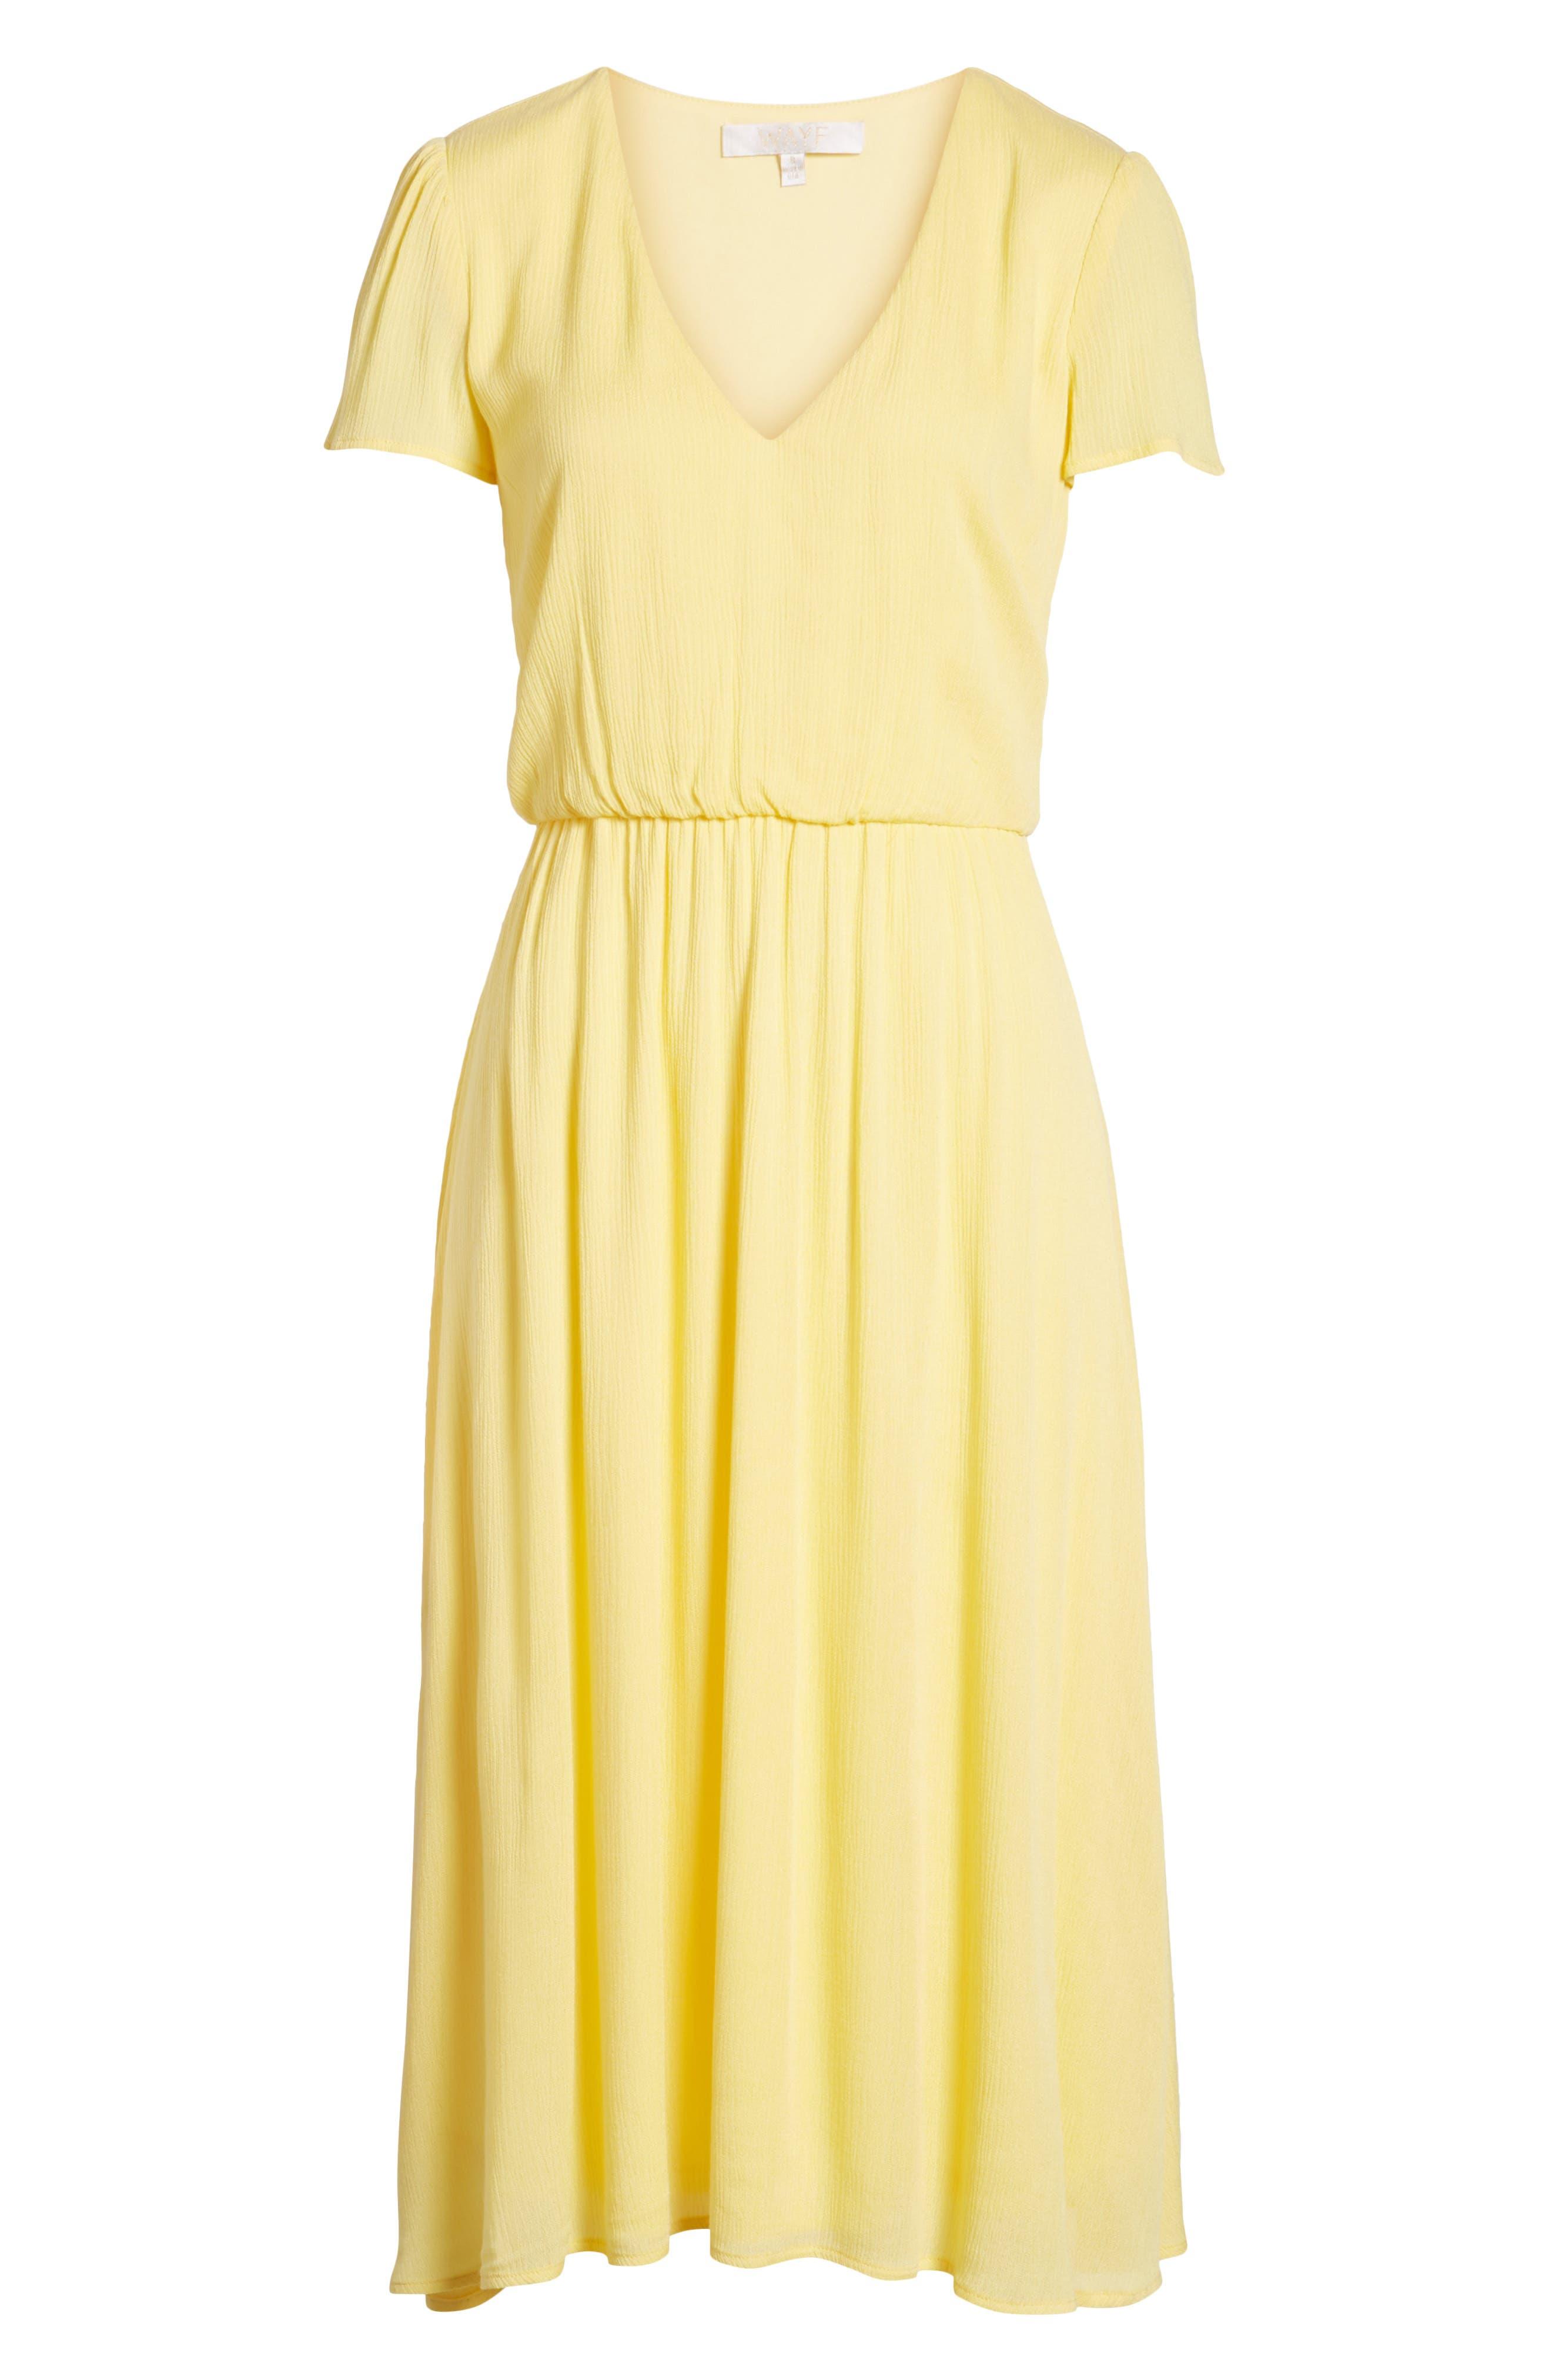 women's yellow dresses | nordstrom